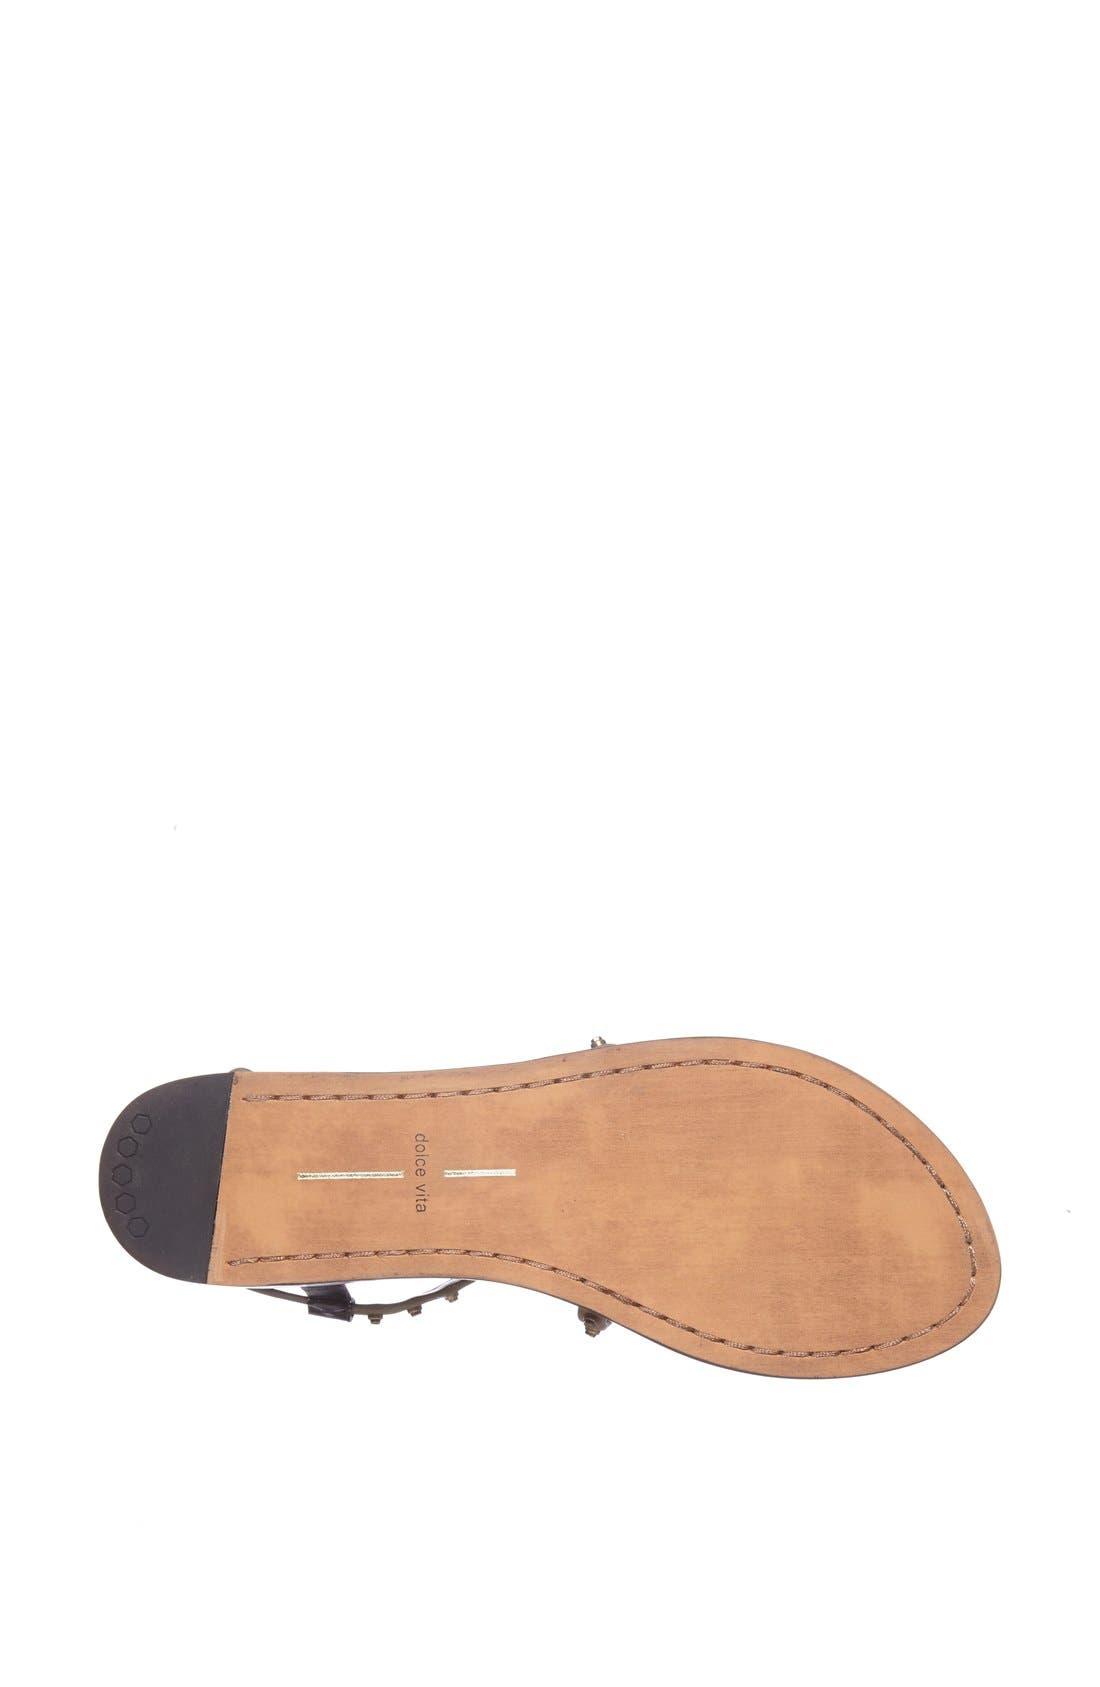 Alternate Image 4  - Dolce Vita 'Flame' Studded Leather Sandal